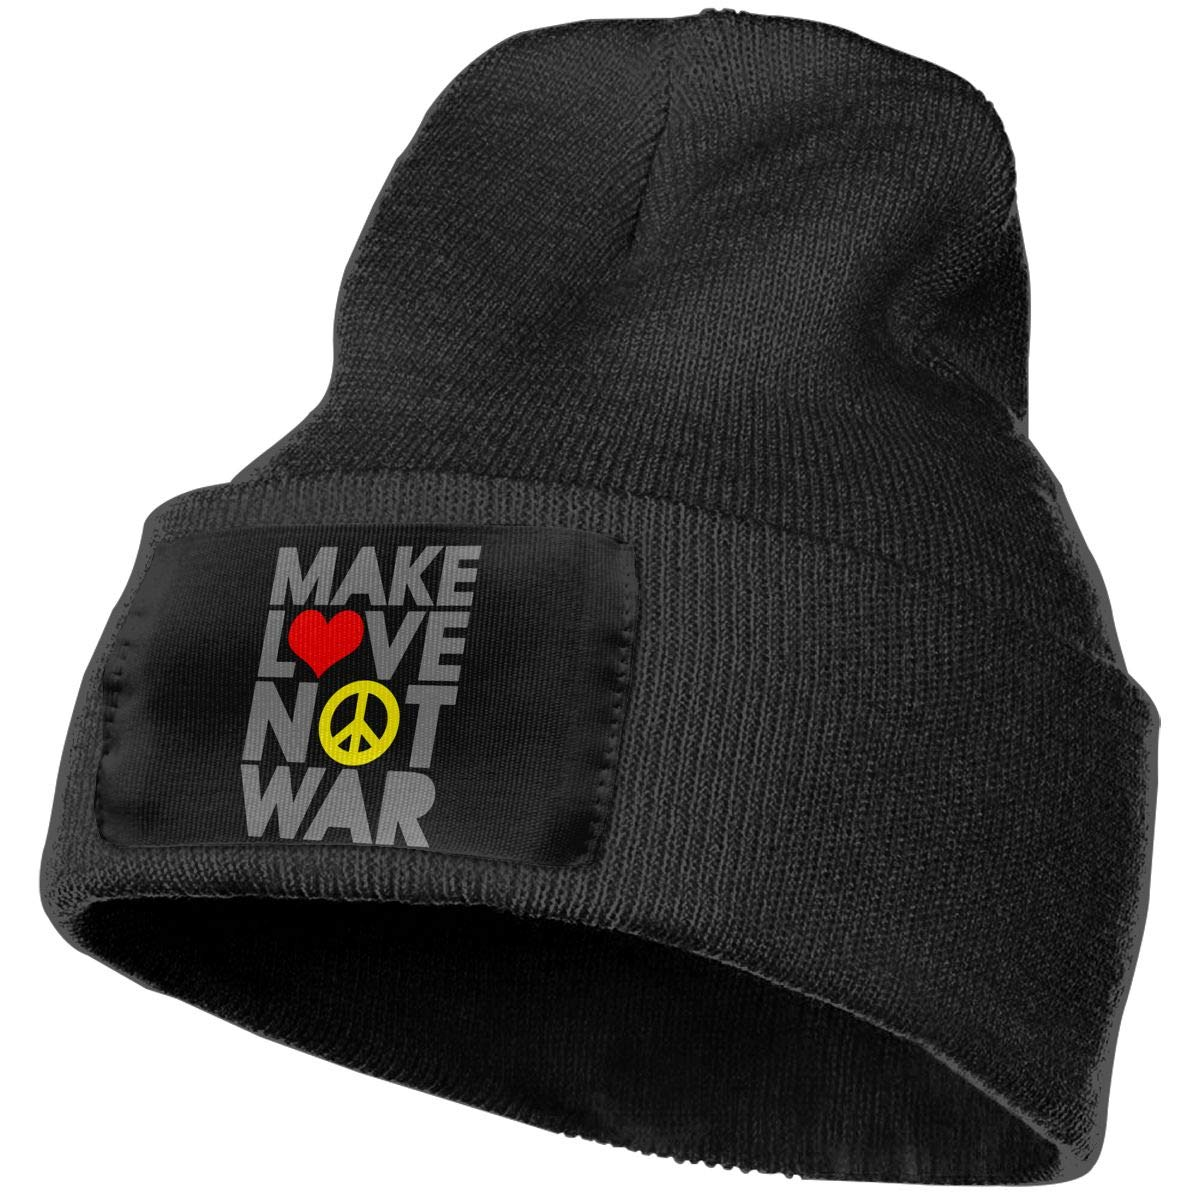 Mens Womens 100/% Acrylic Knitted Hat Cap Love Make Love NOT WAR Warm Beanie Hat